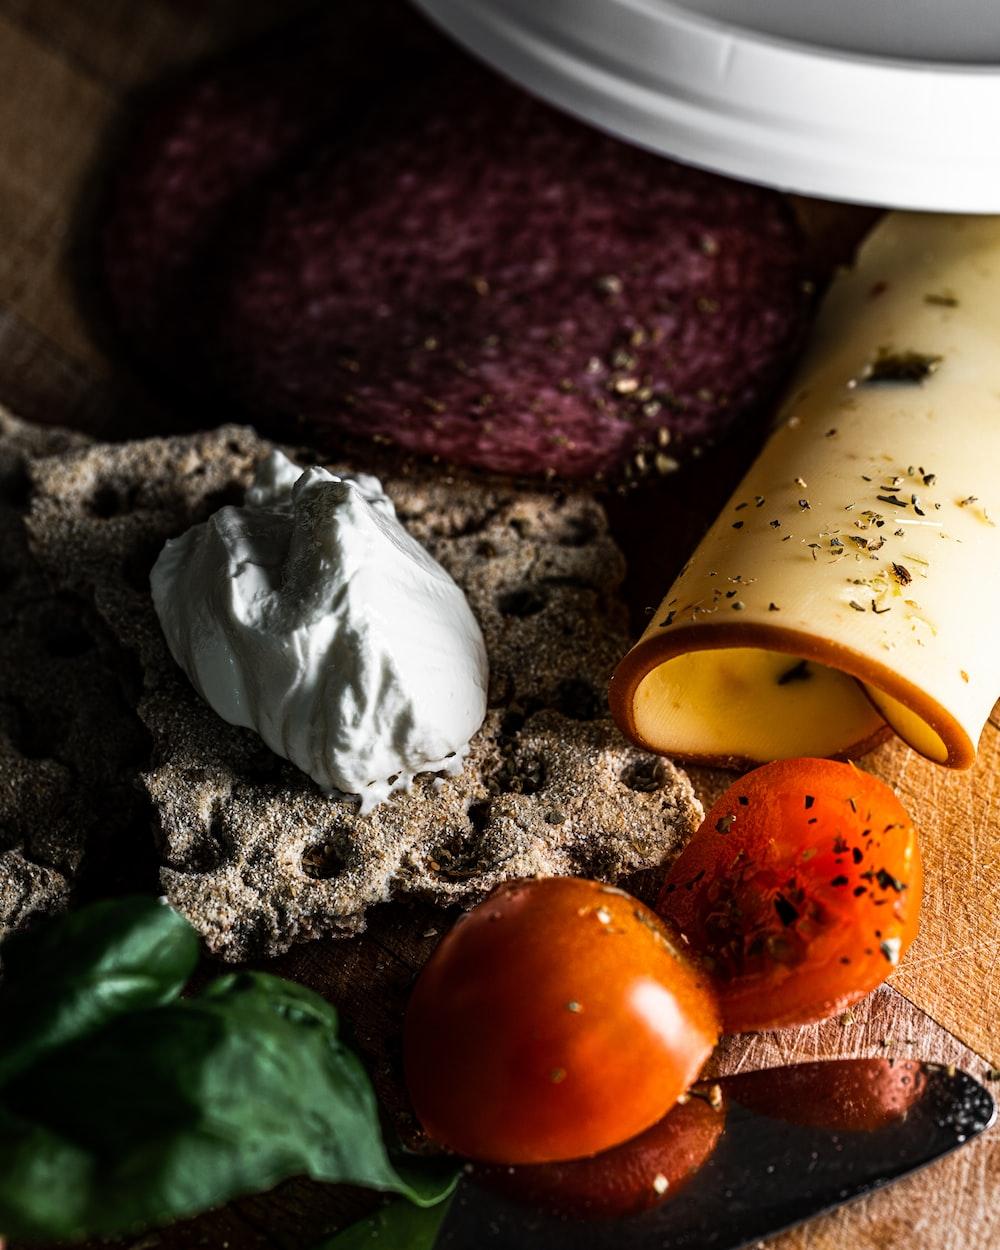 cheese near tomatoes